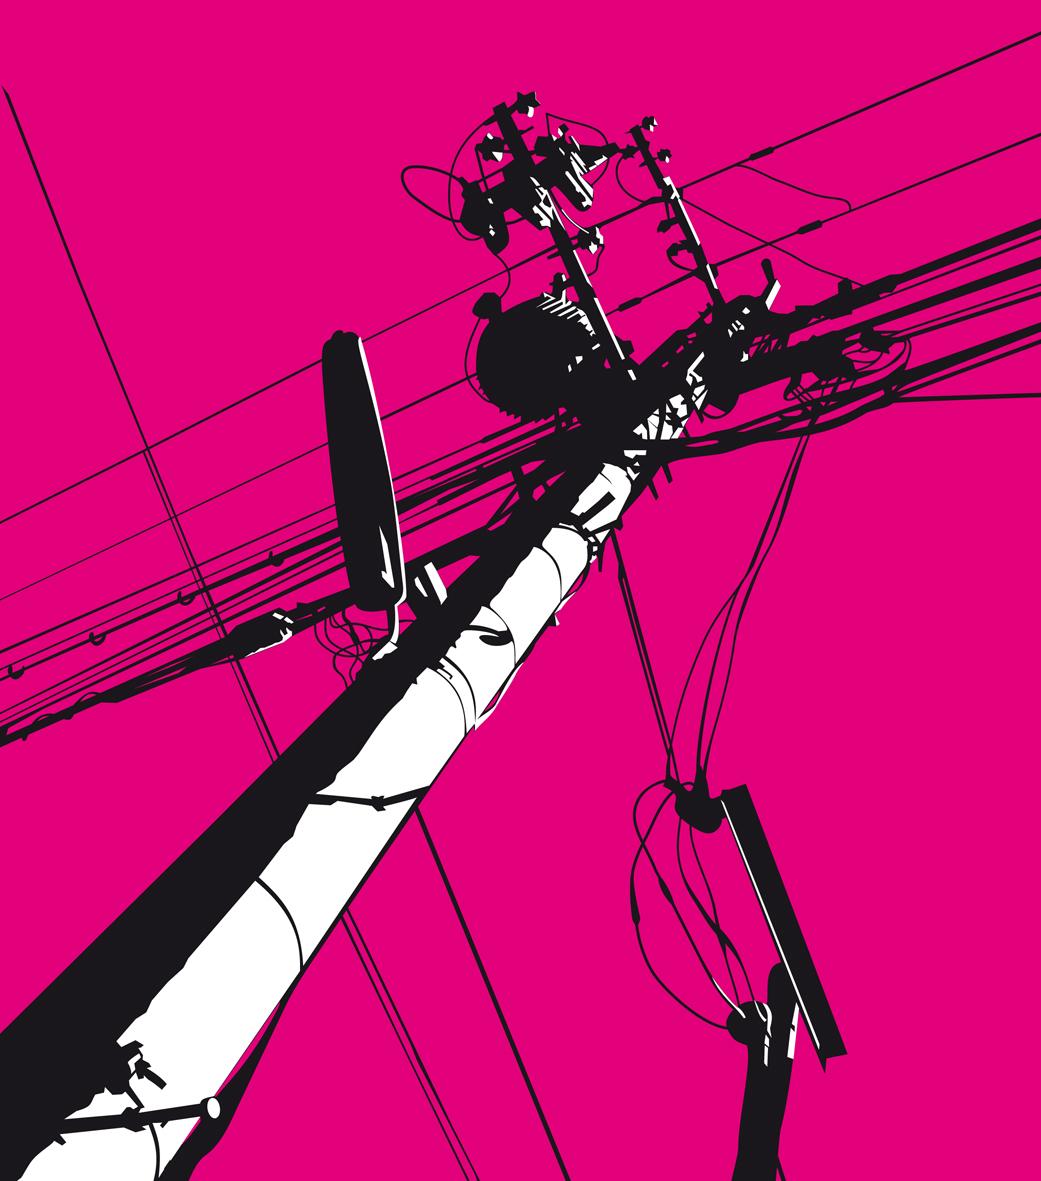 mural torre electrica rosa